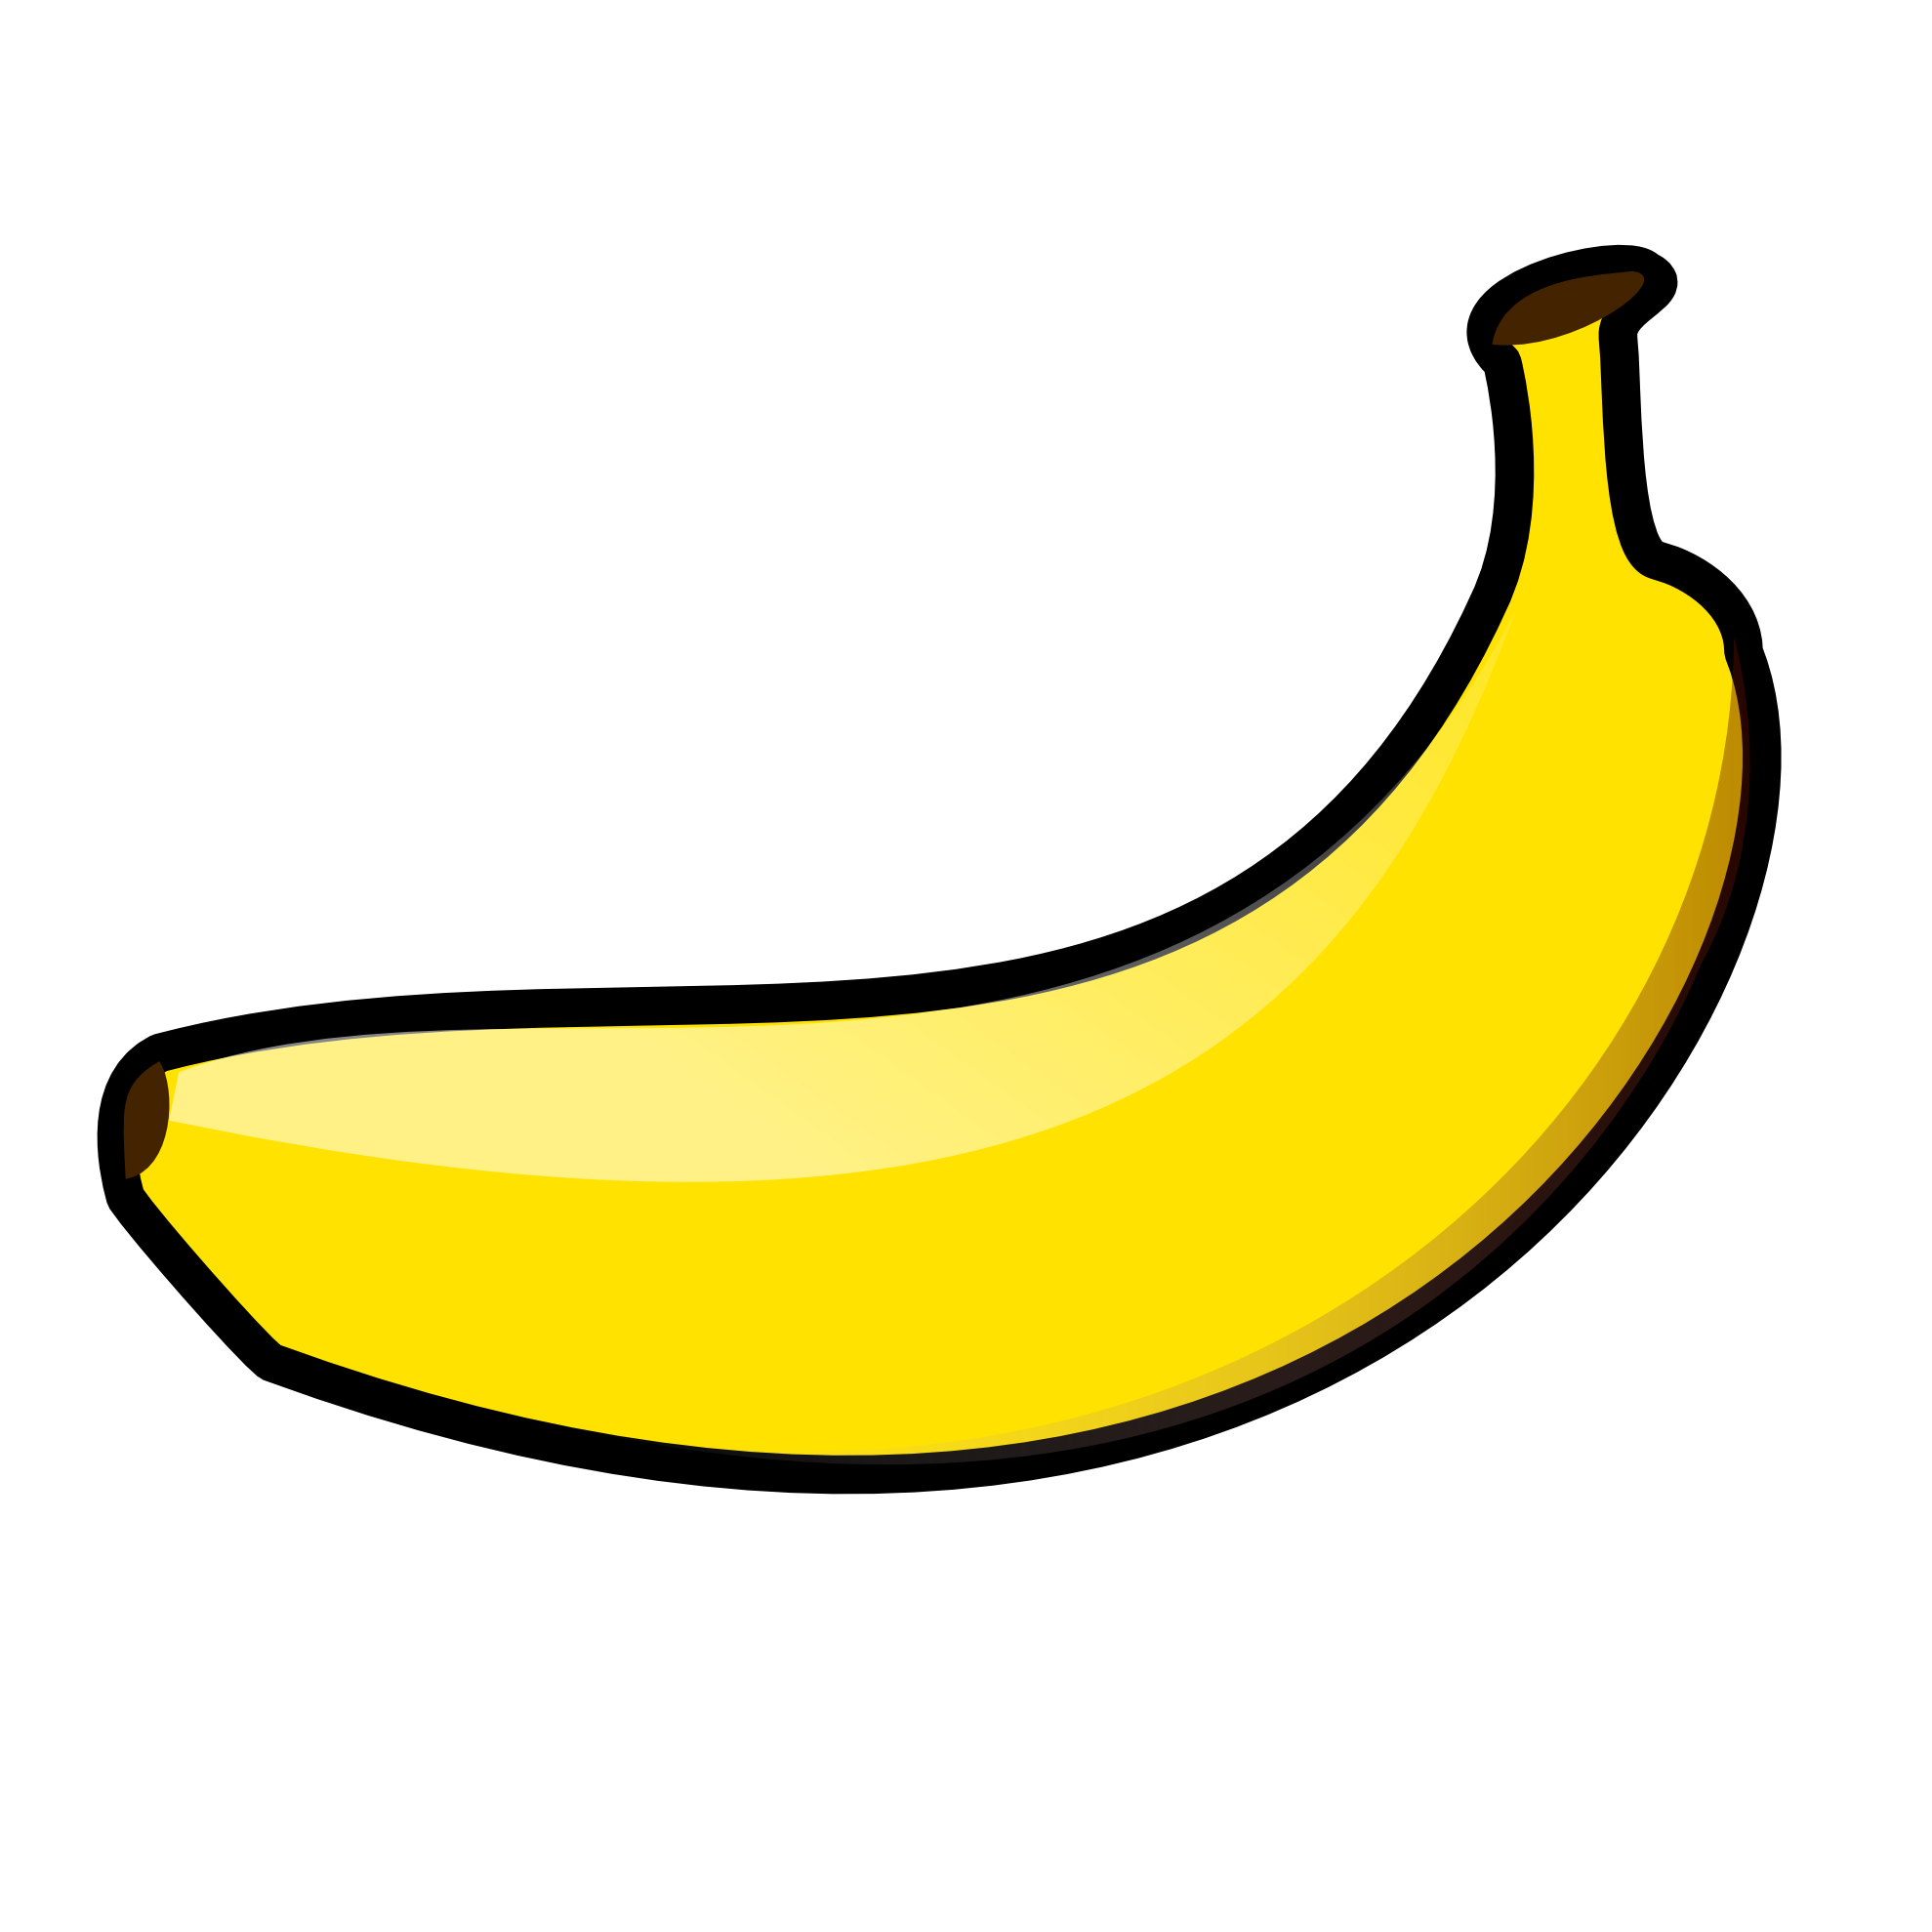 Banana Clipart.